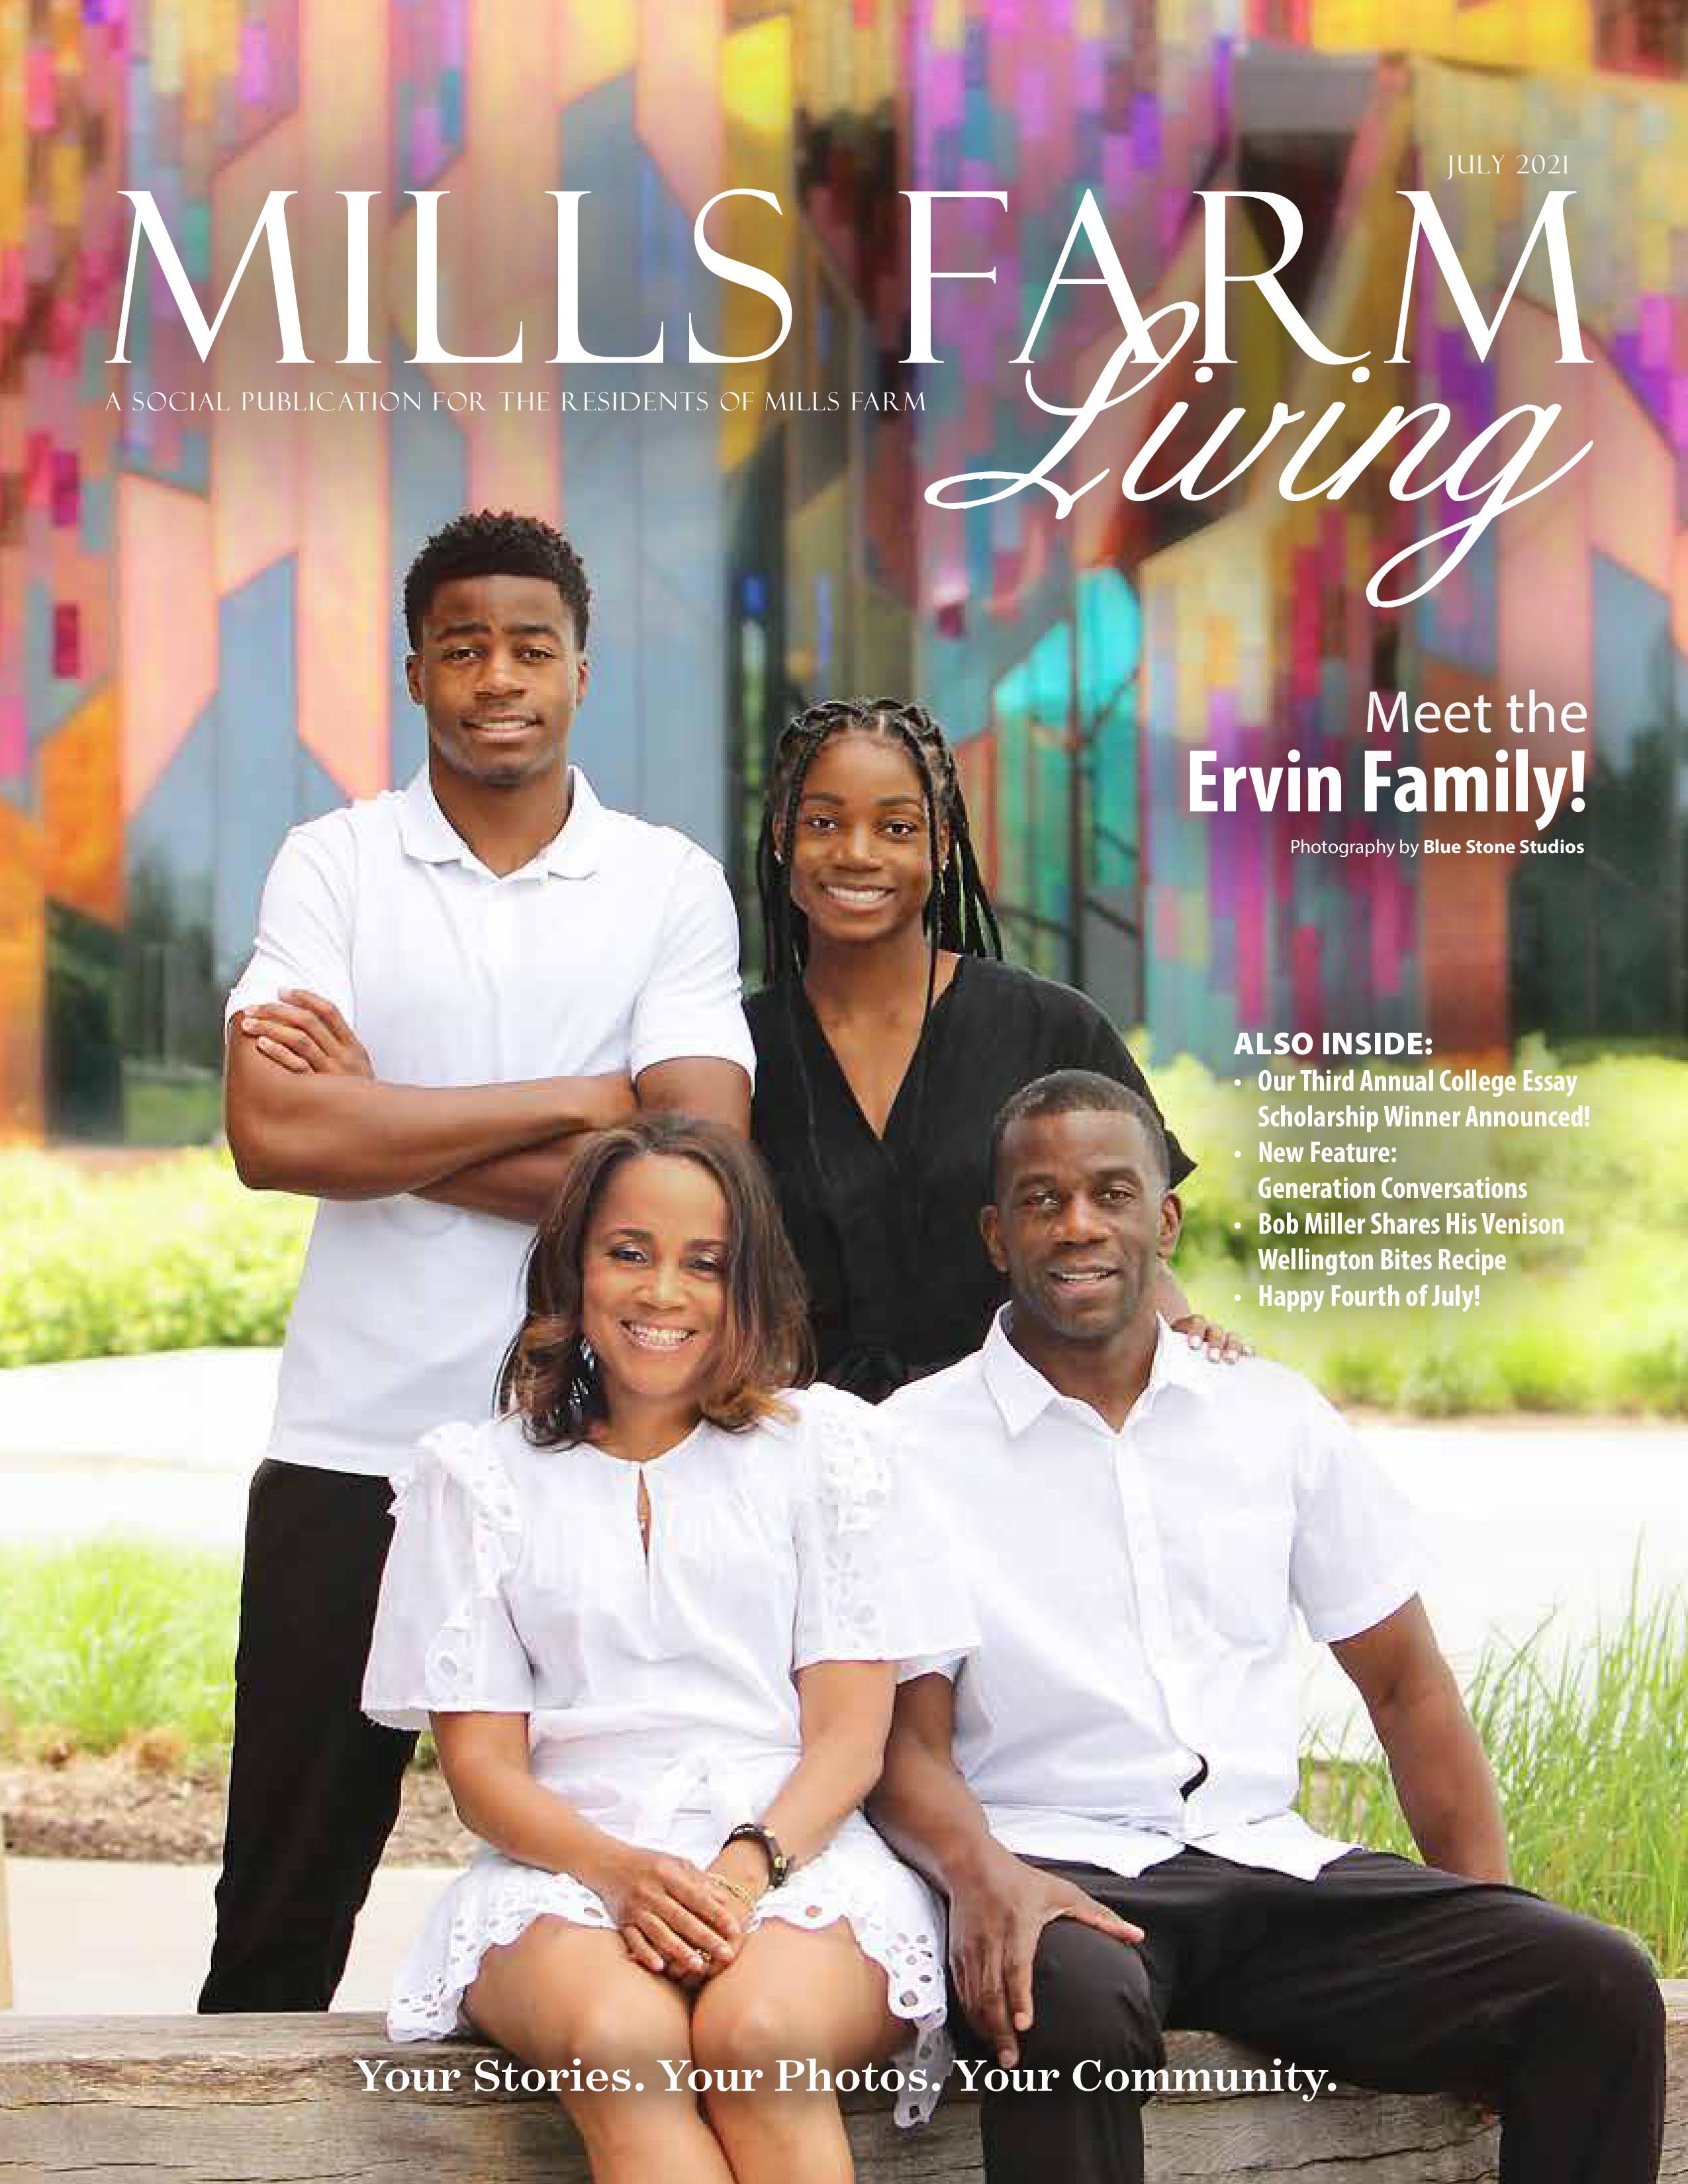 Mills Farm Living 2021-07-01